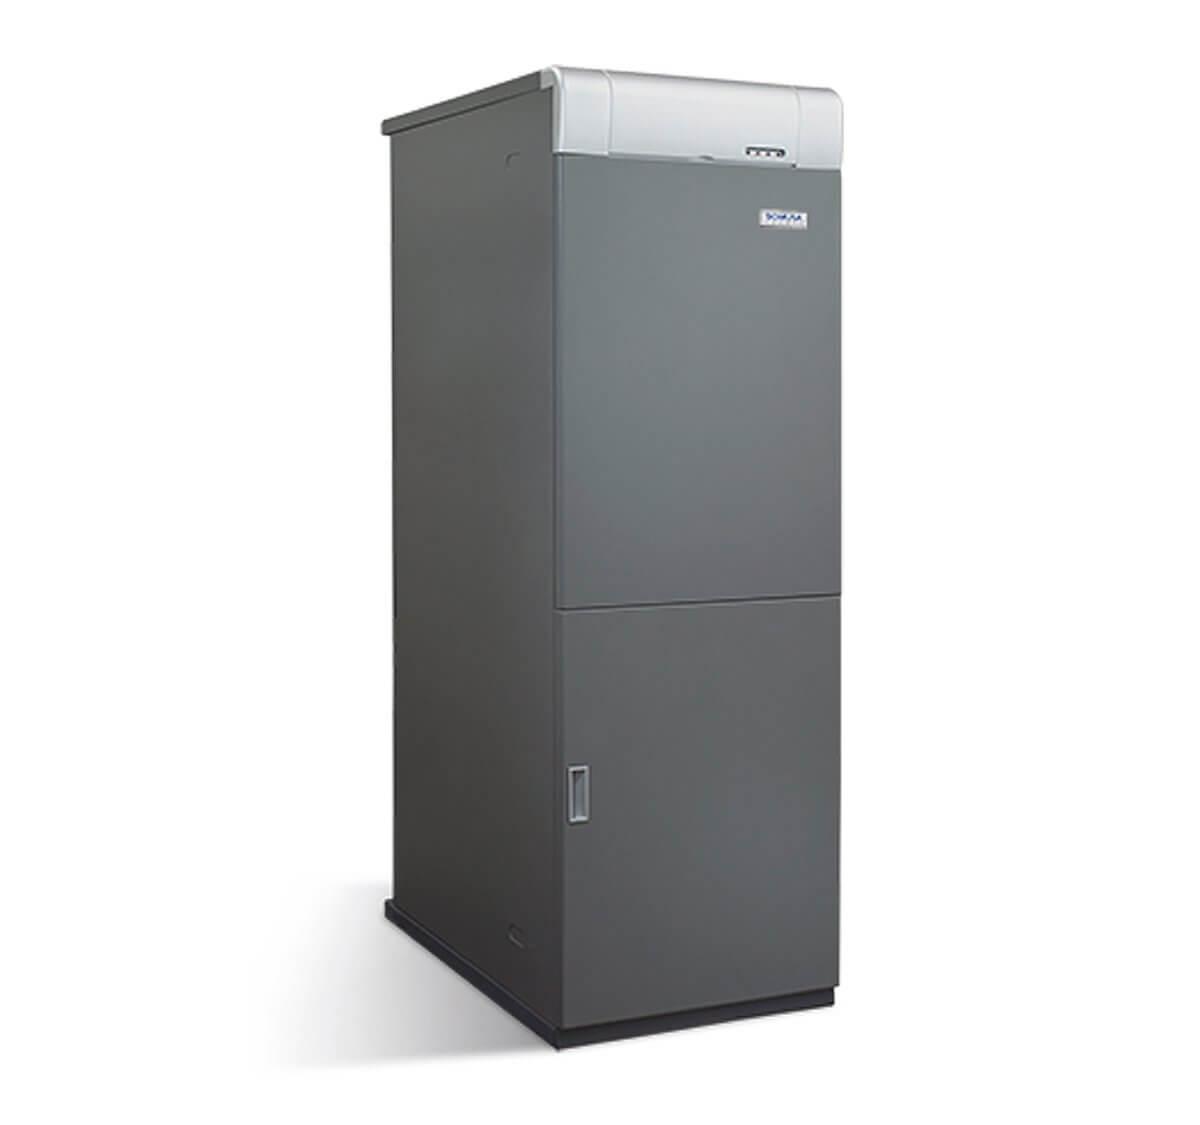 Caldera de Gasoil Domusa MCF 40HDX VE 100 LTS